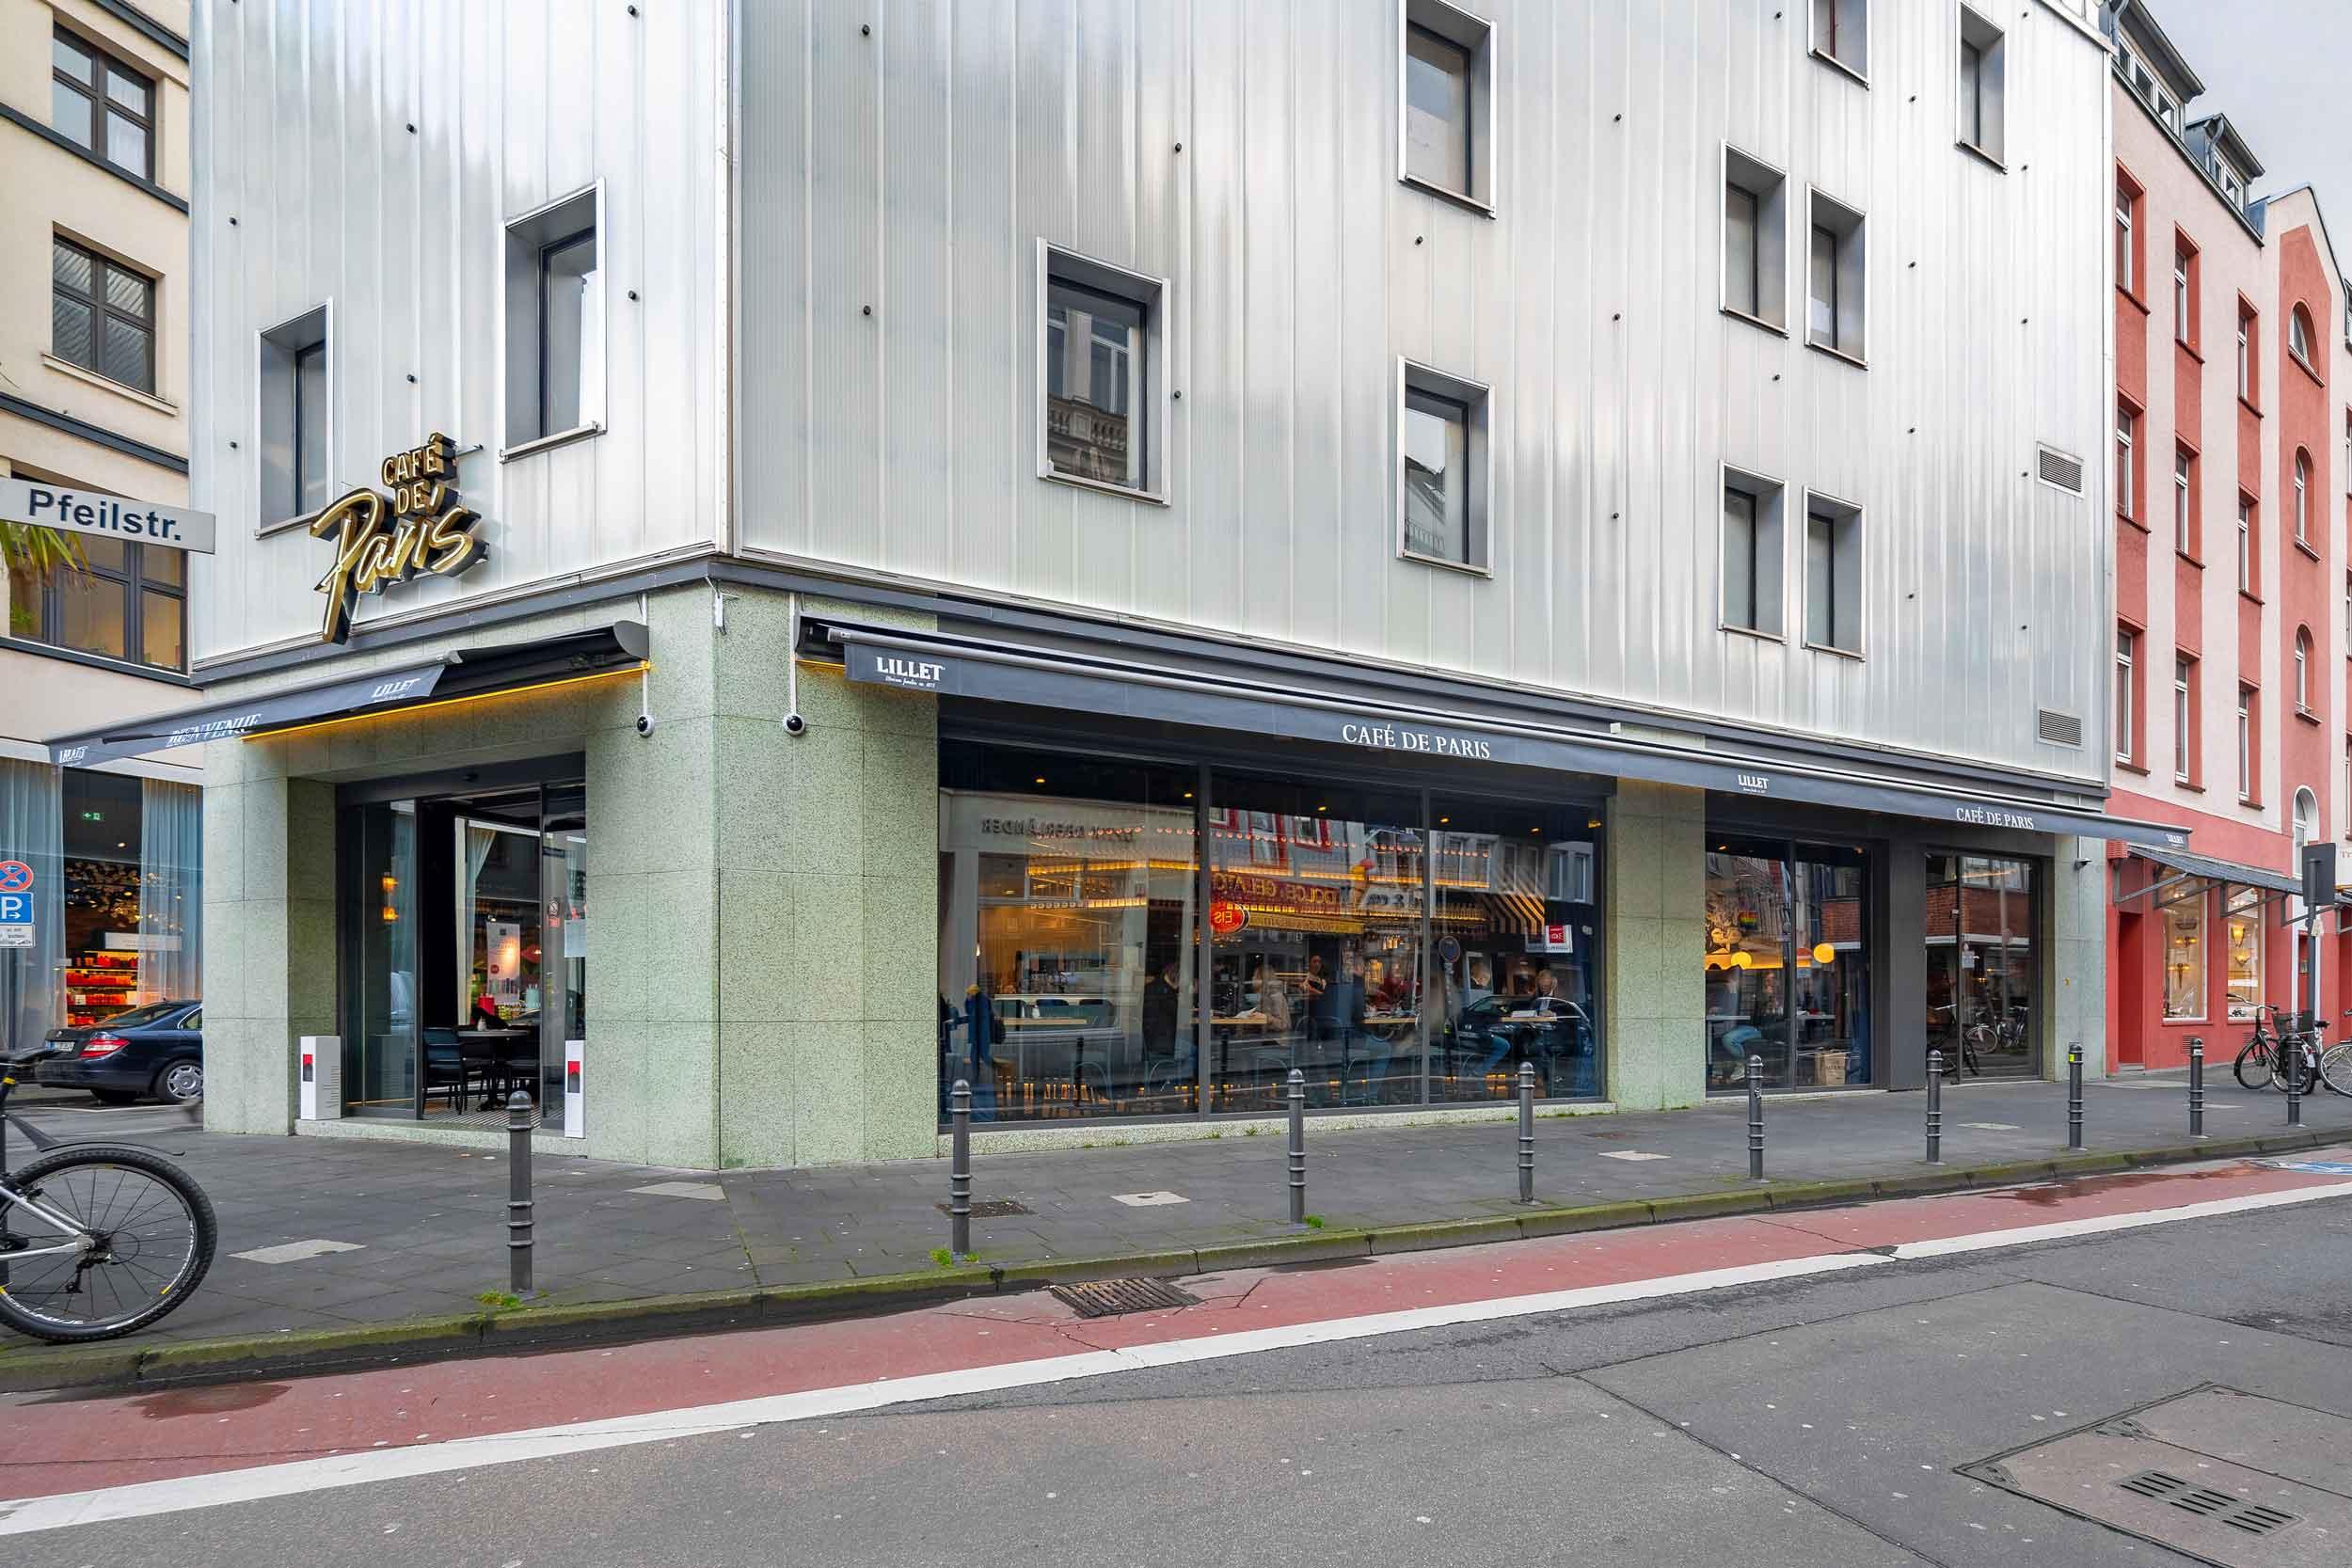 Café_de_Paris_Restaurant